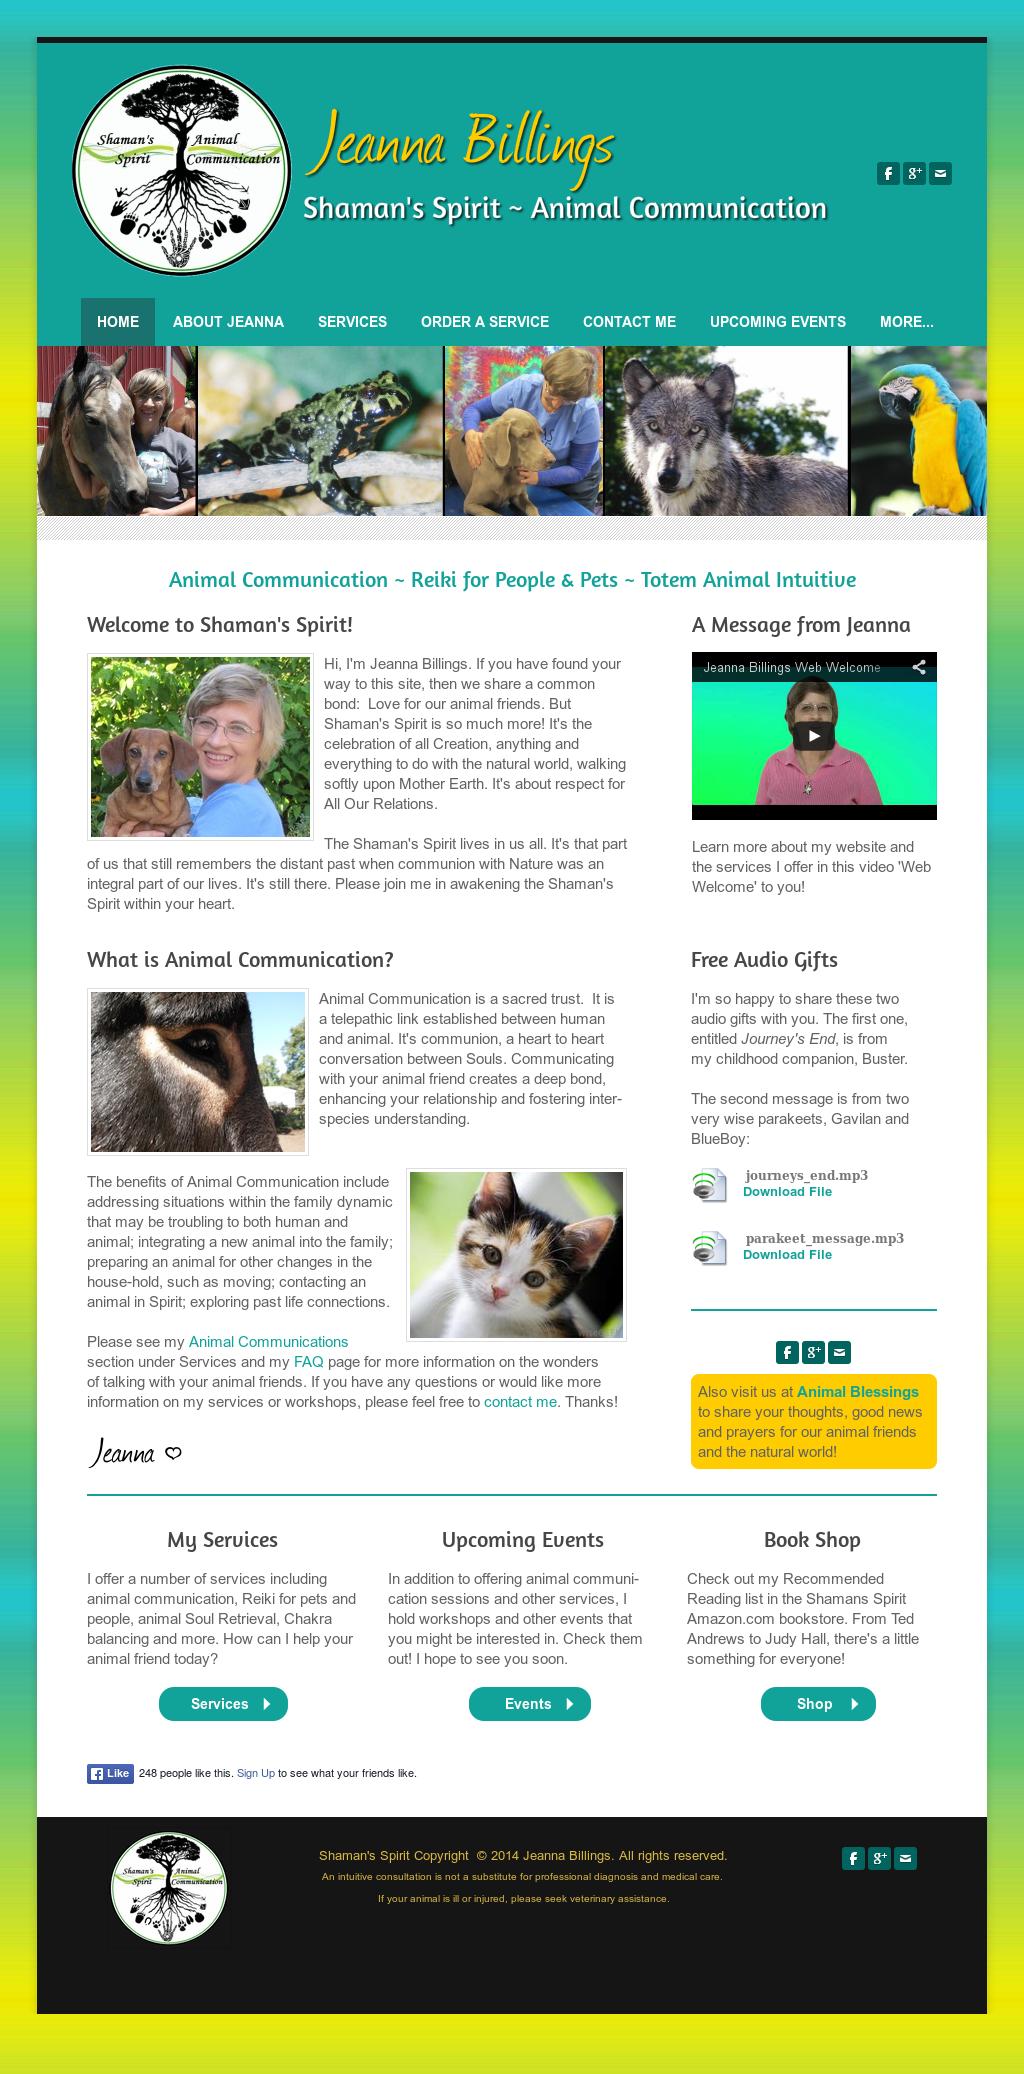 Shaman's Spirit Animal Communication Competitors, Revenue